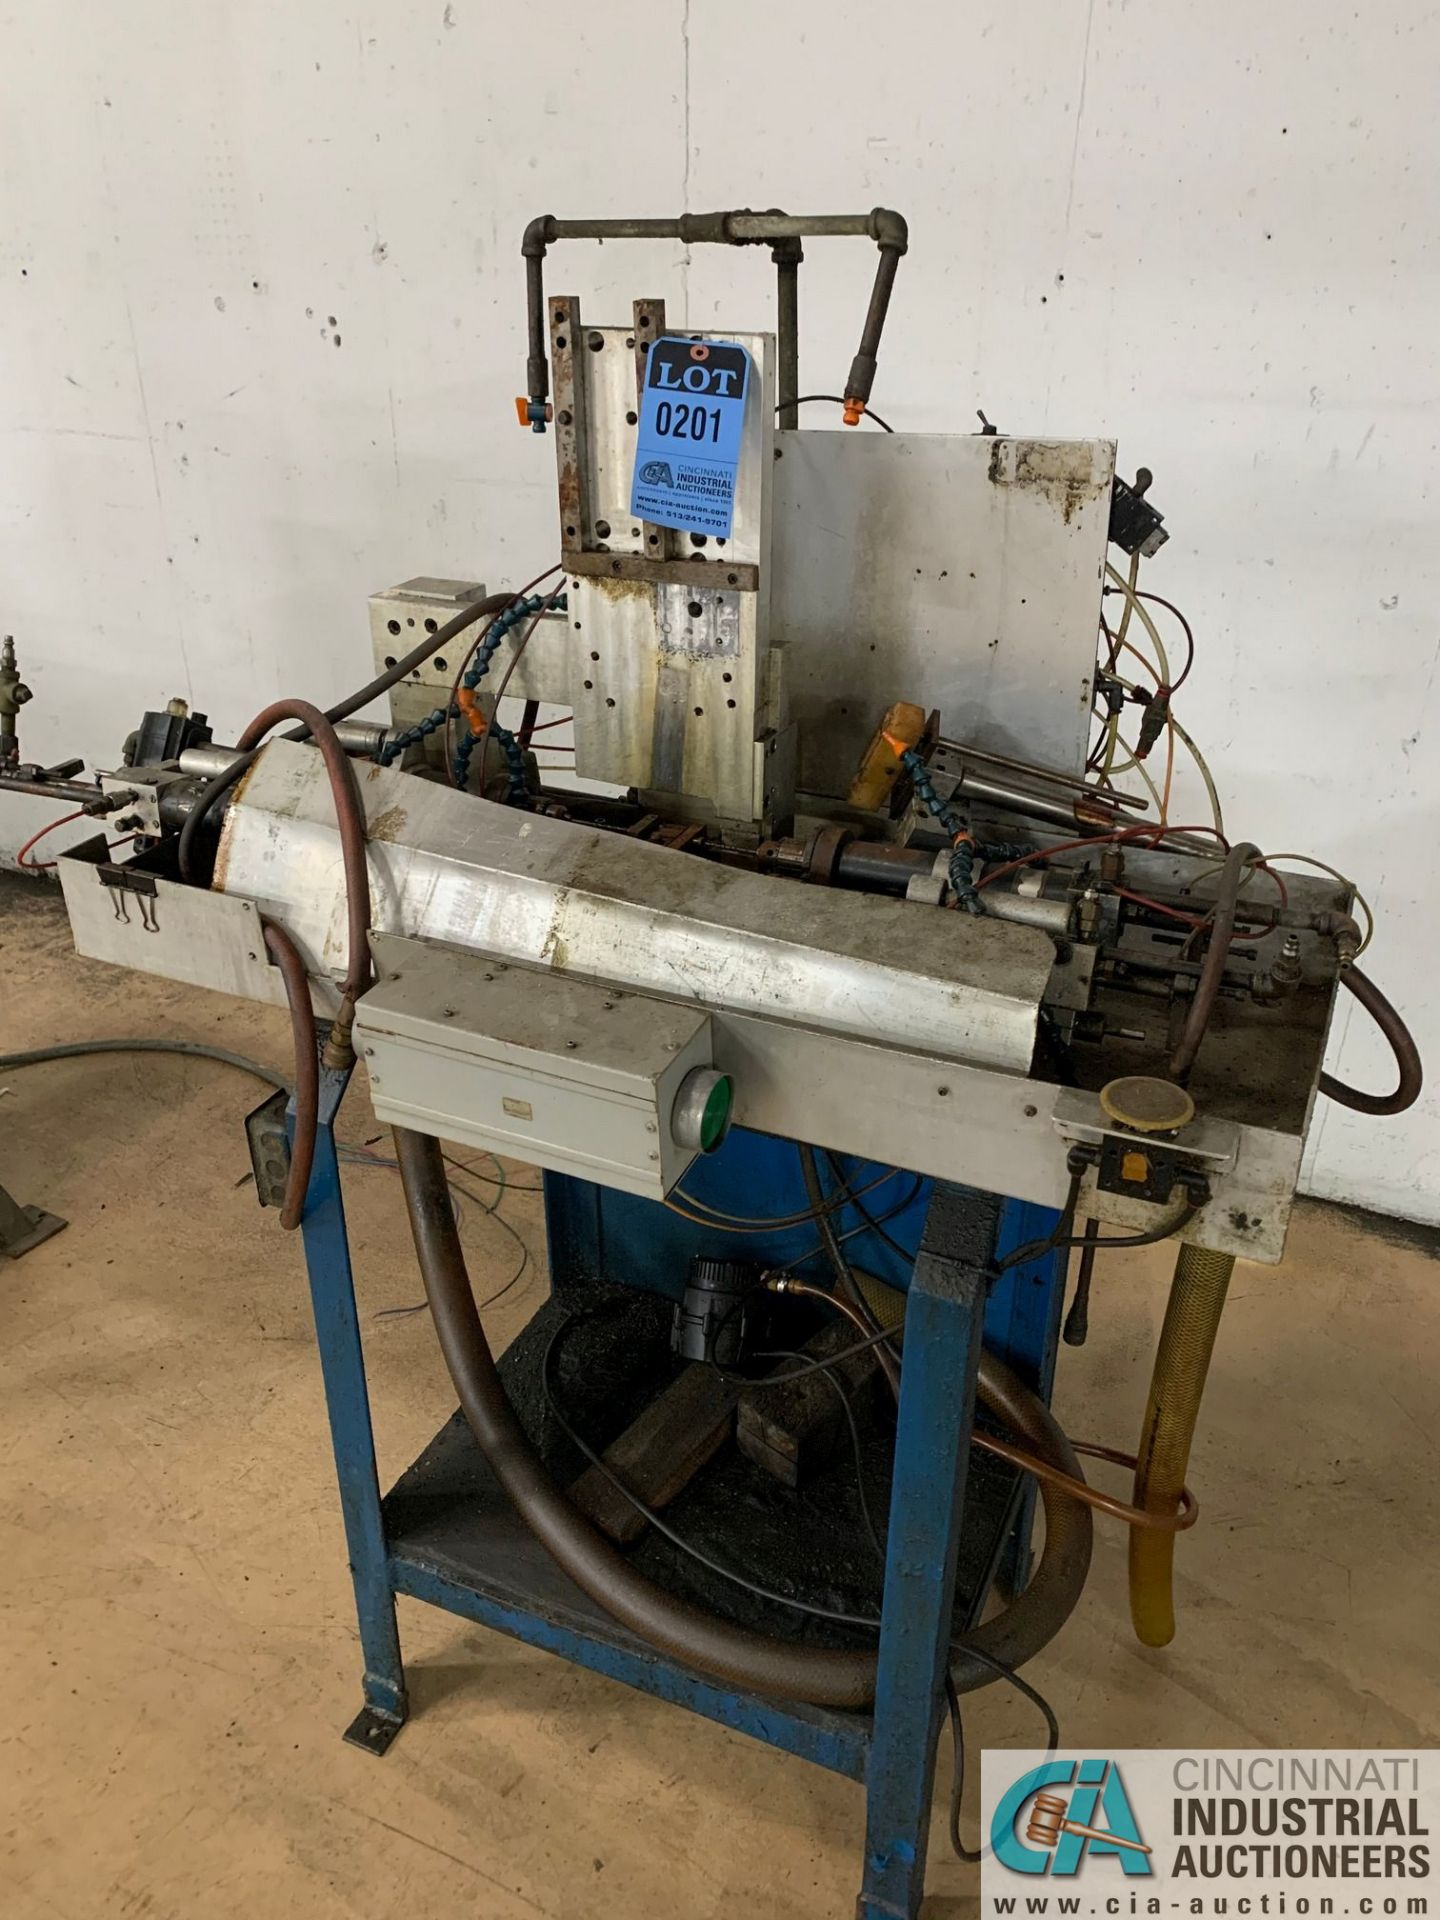 4-SPINDLE HORIZONTAL DRILLING MACHINE